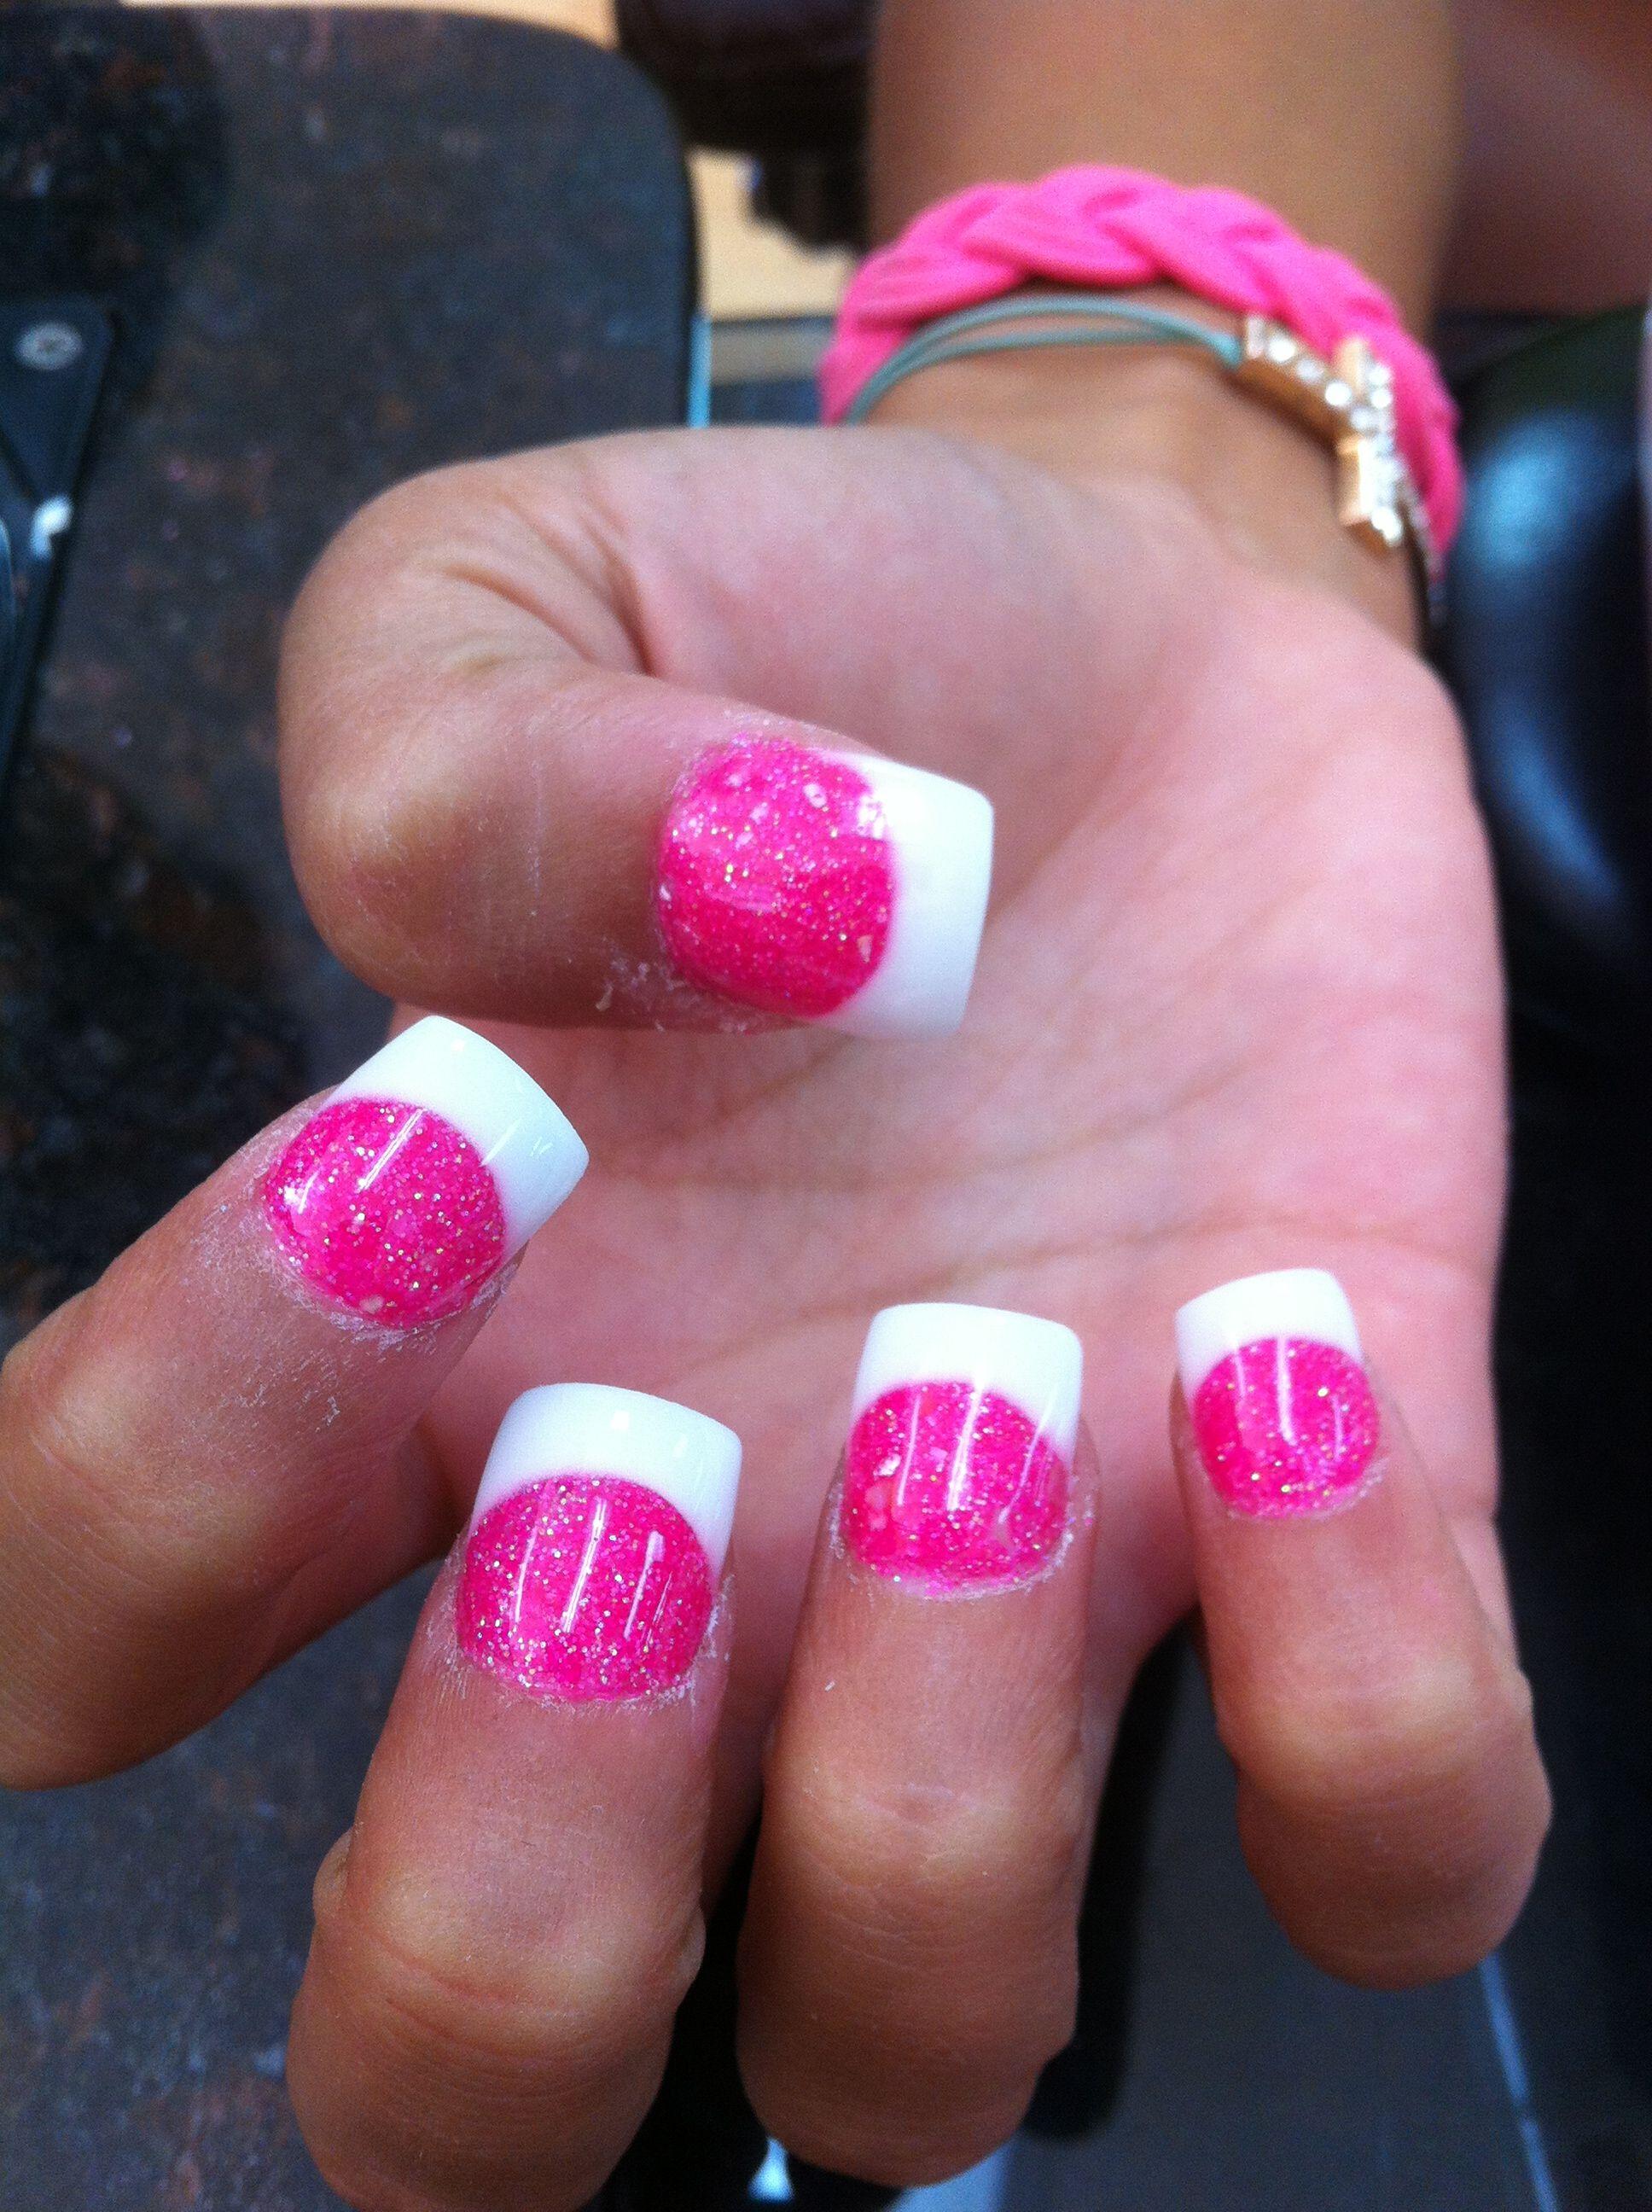 Jelly Nails Pink Neon See Through Nail Art Magenta Magenta Nails Jelly Nails Transparent Nails